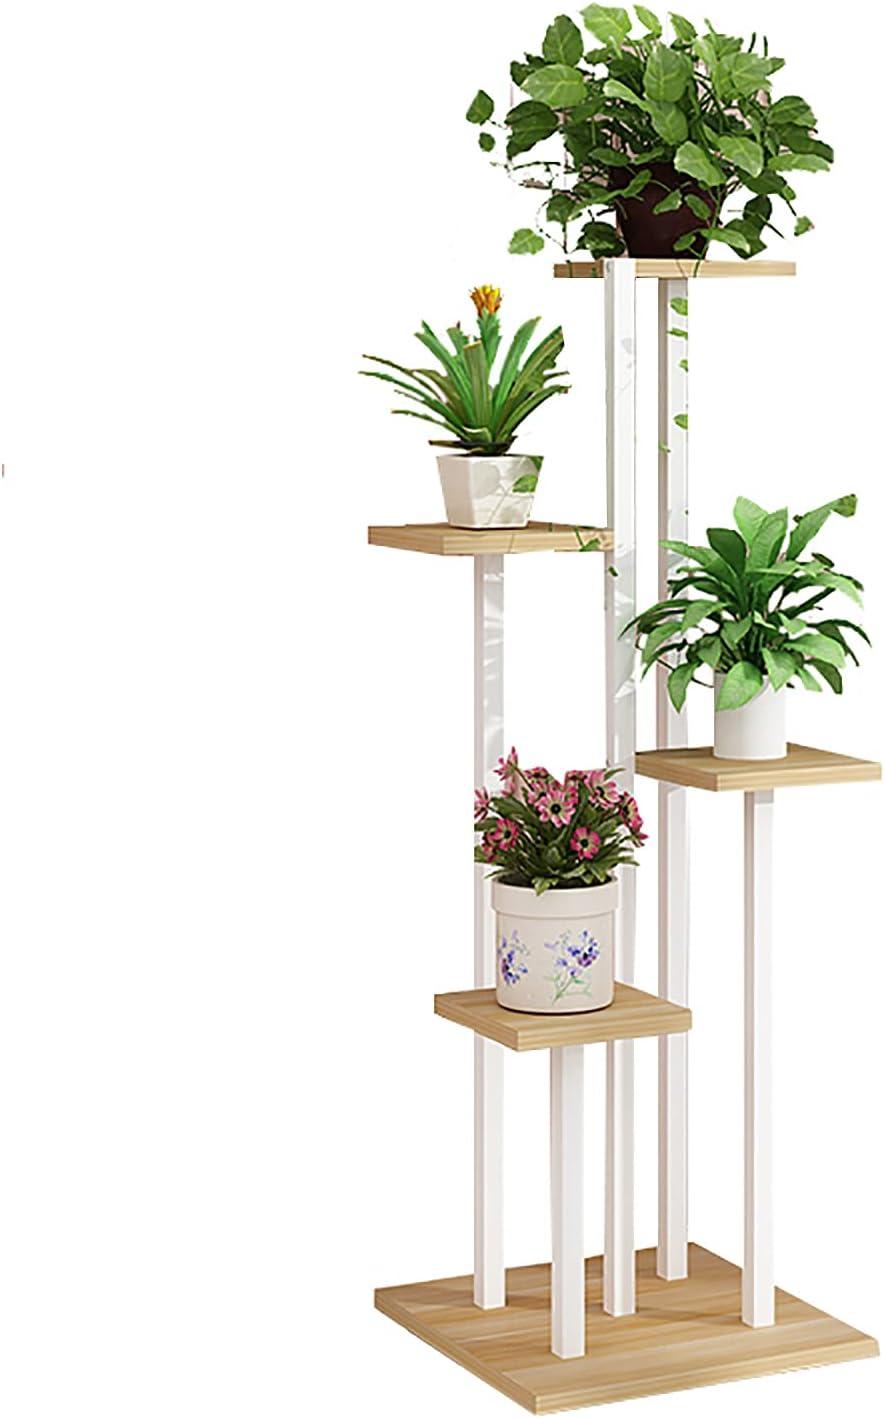 Max 53% OFF Flower Shelves,Metal Stand Wooden Mult Rack Tabletop Super intense SALE